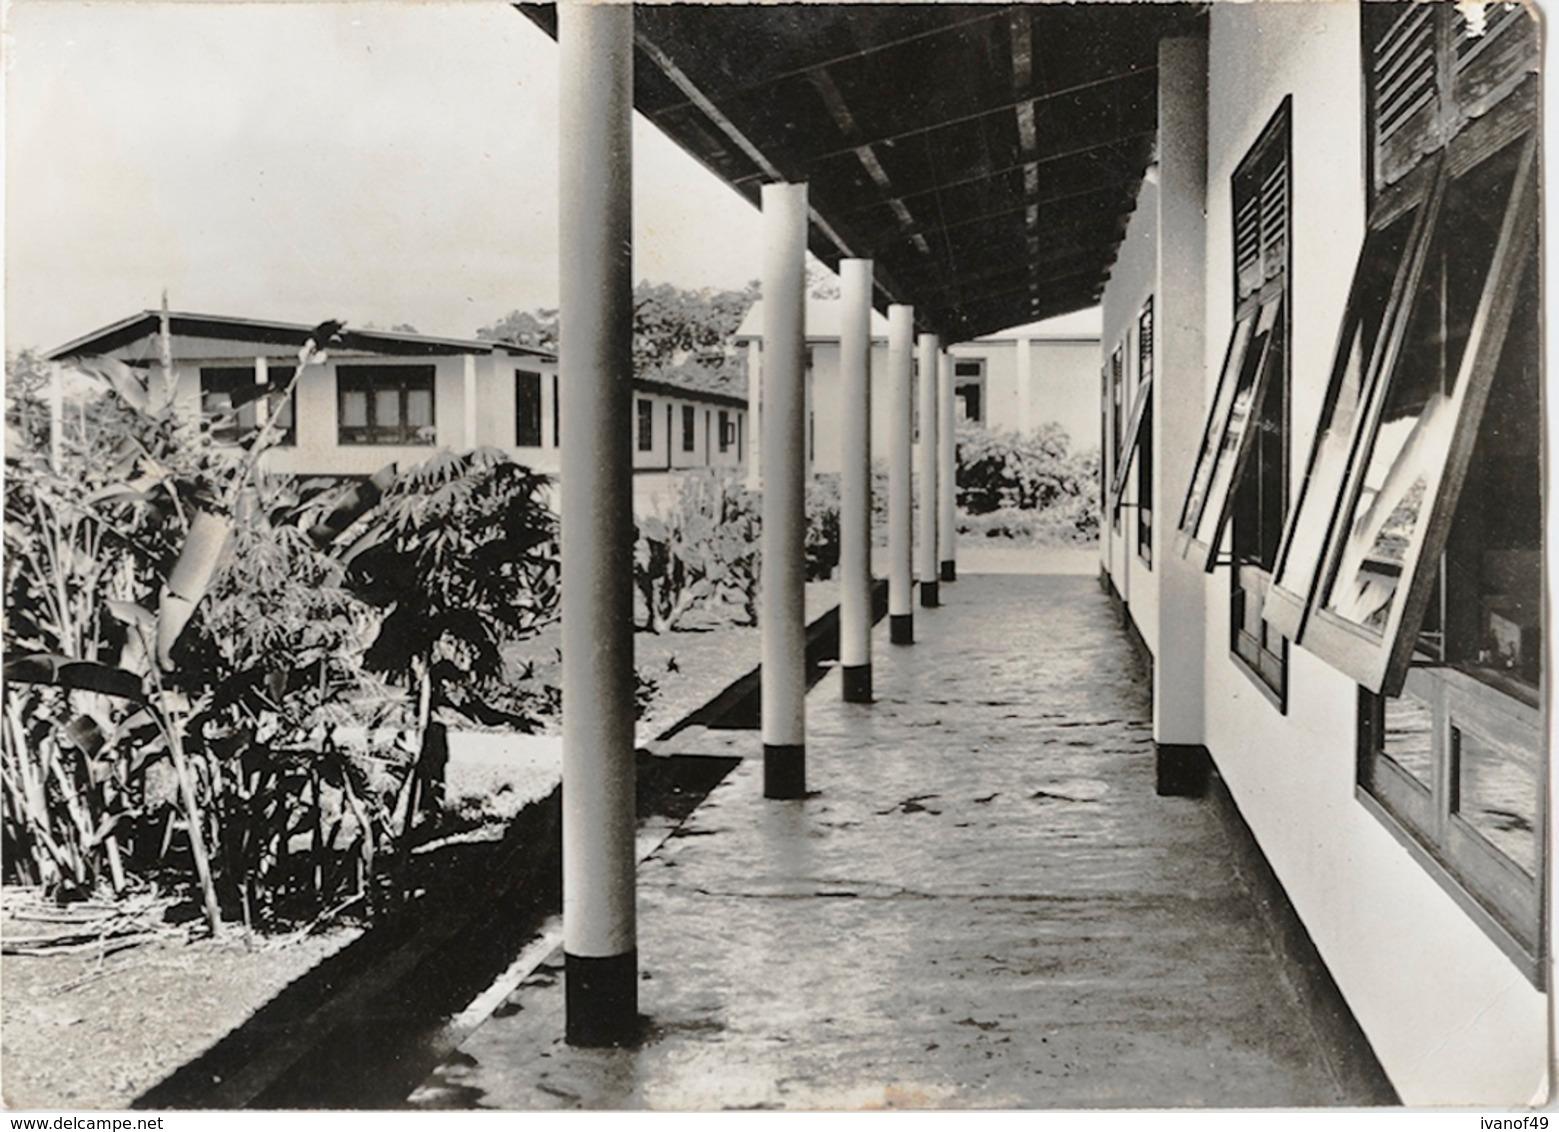 CAMEROUN - DOUME - College De La Salle - CPSM - Cameroun